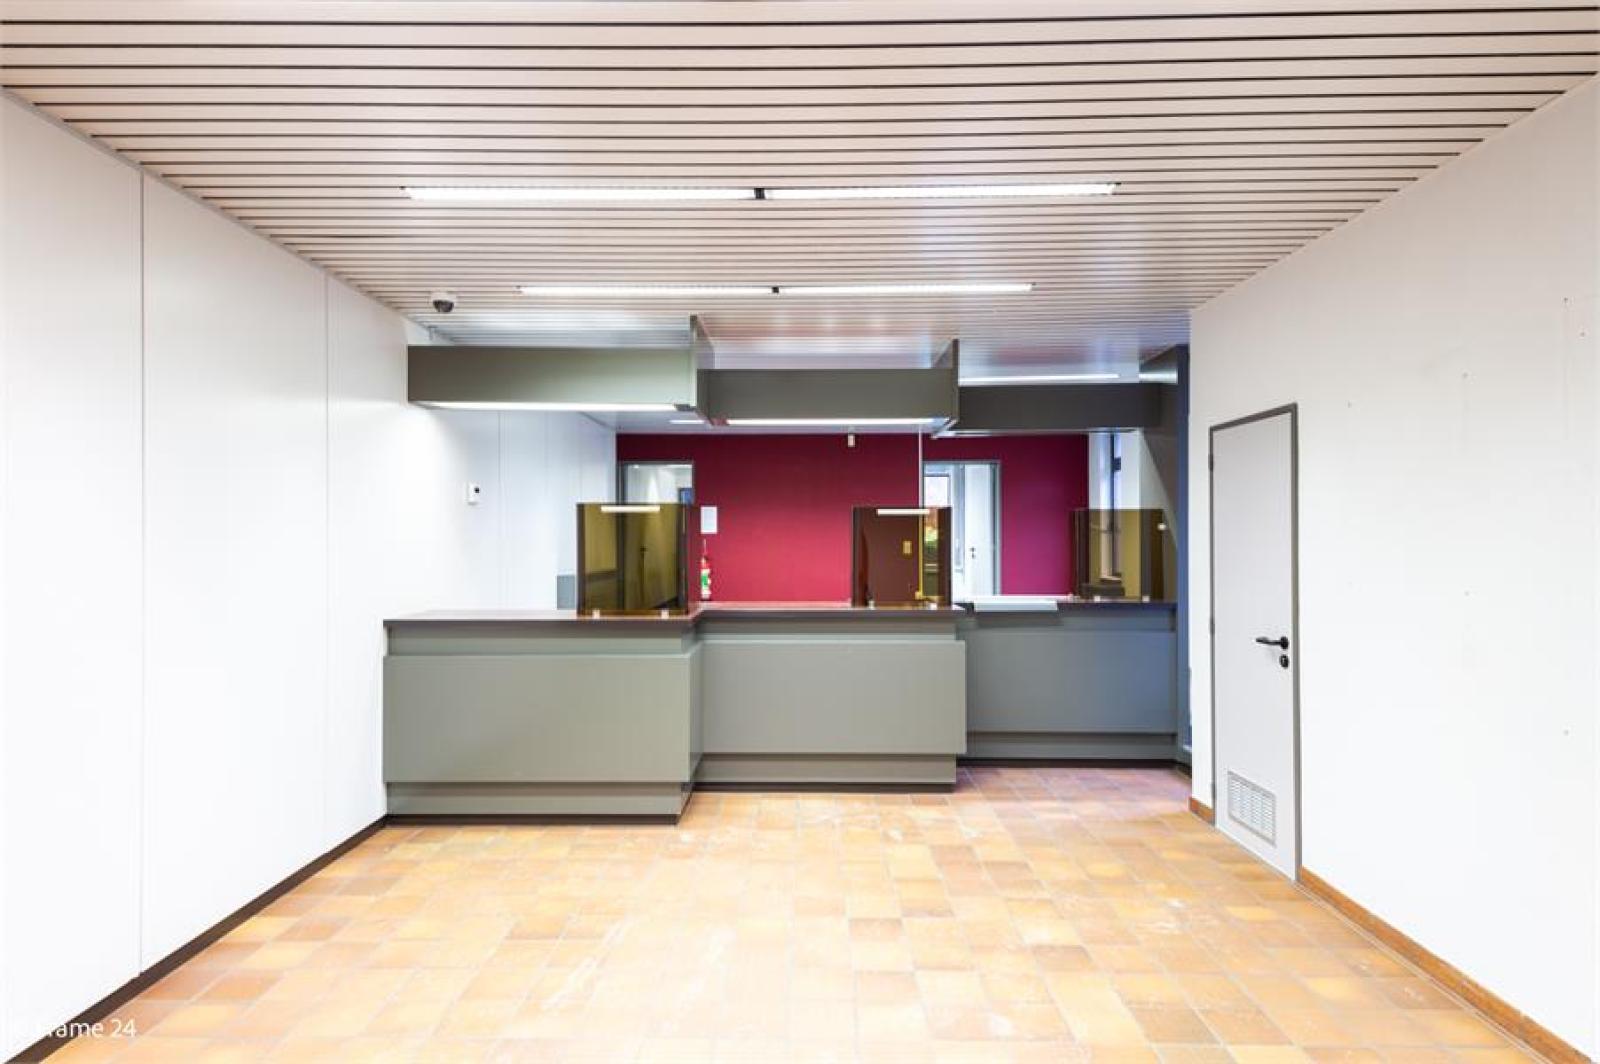 Handelsruimte met riante triplex (200 m²) op centrale ligging te Edegem! afbeelding 3